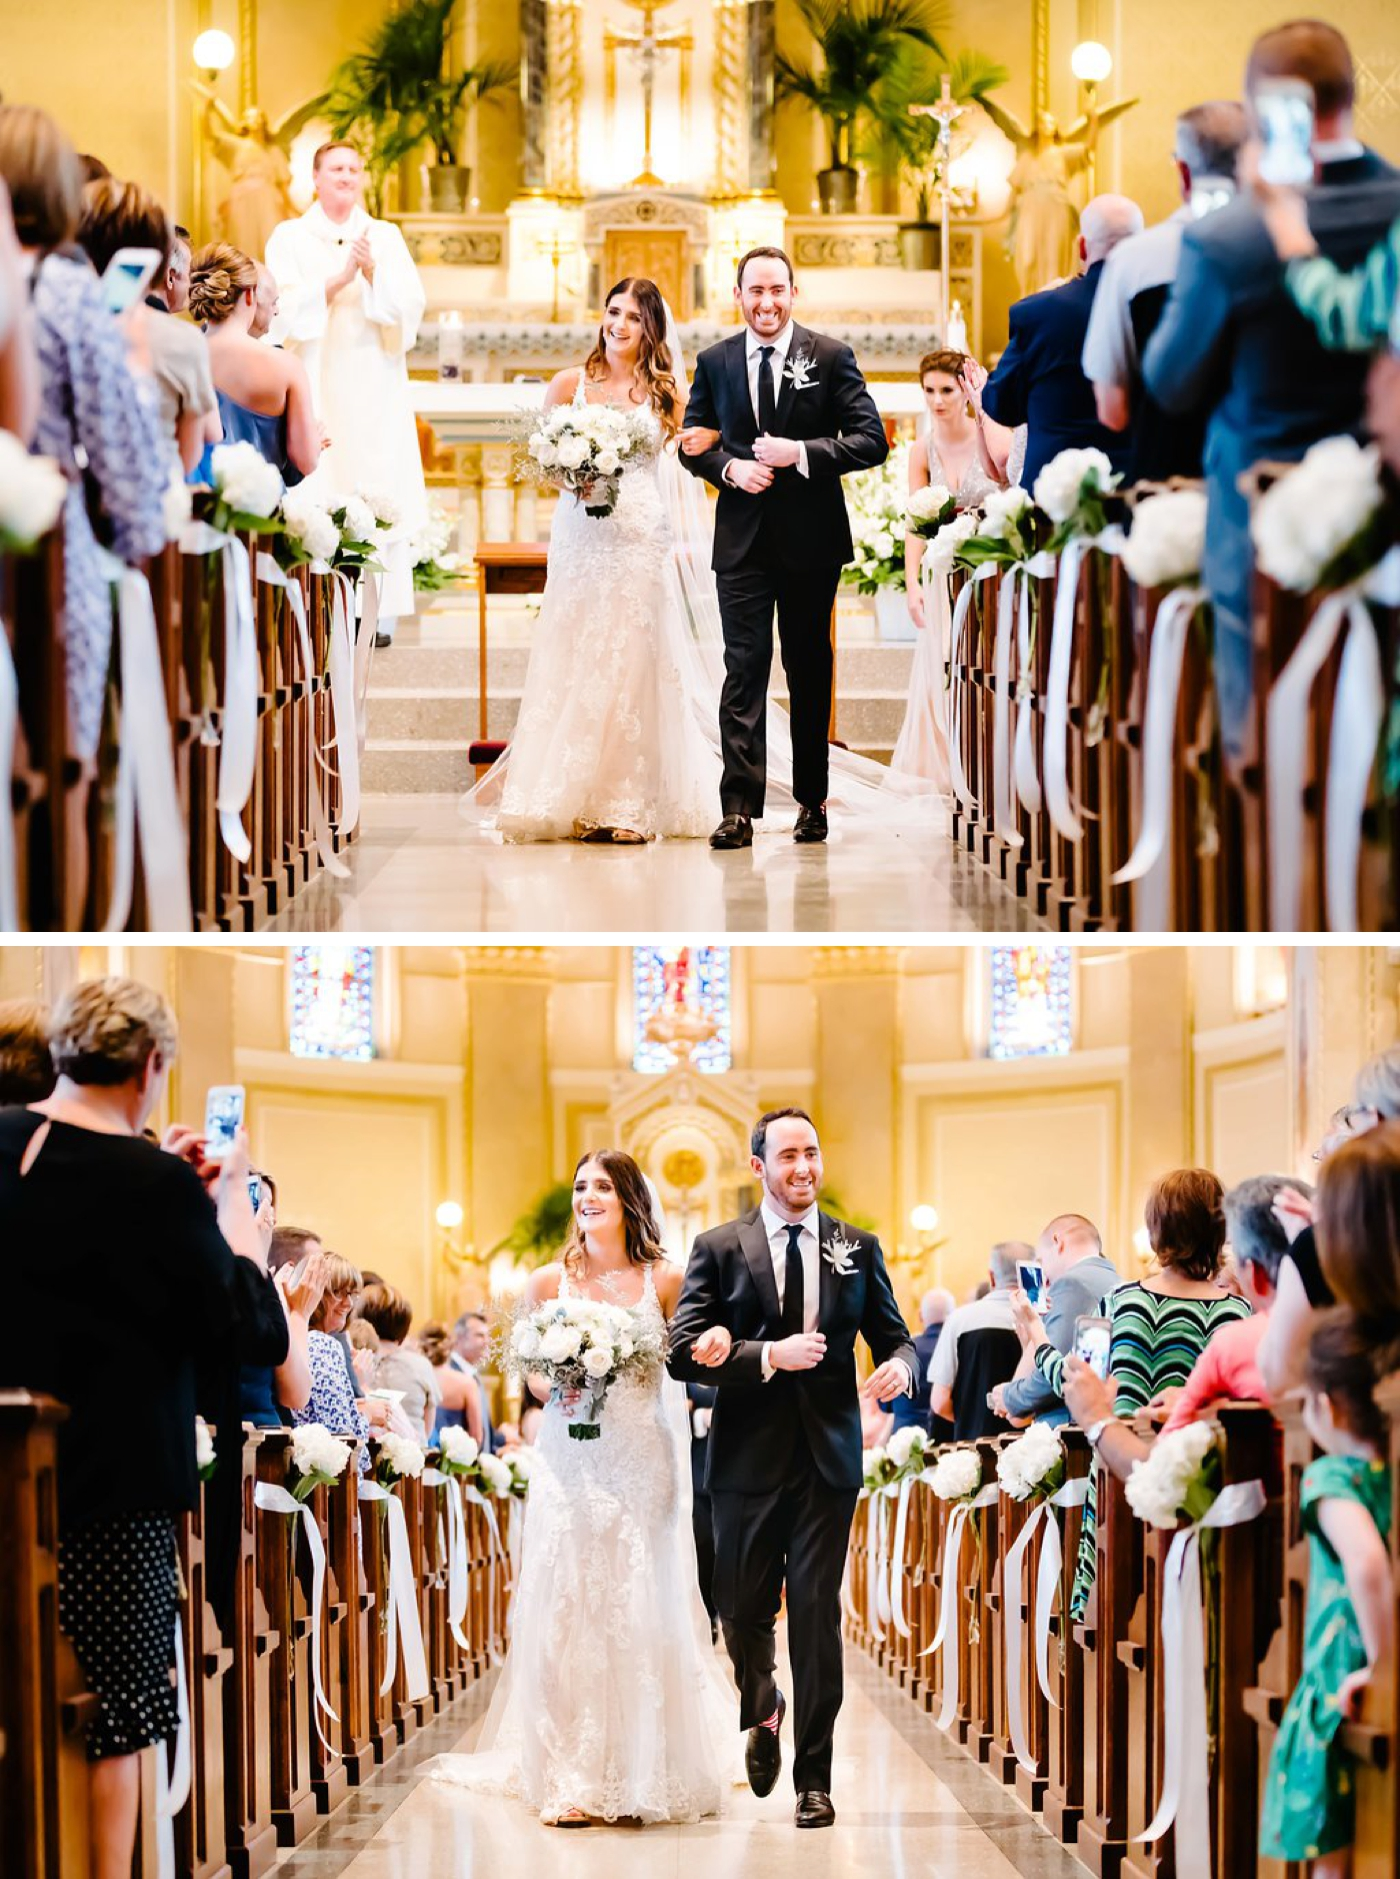 chicago-fine-art-wedding-photography-duncan44